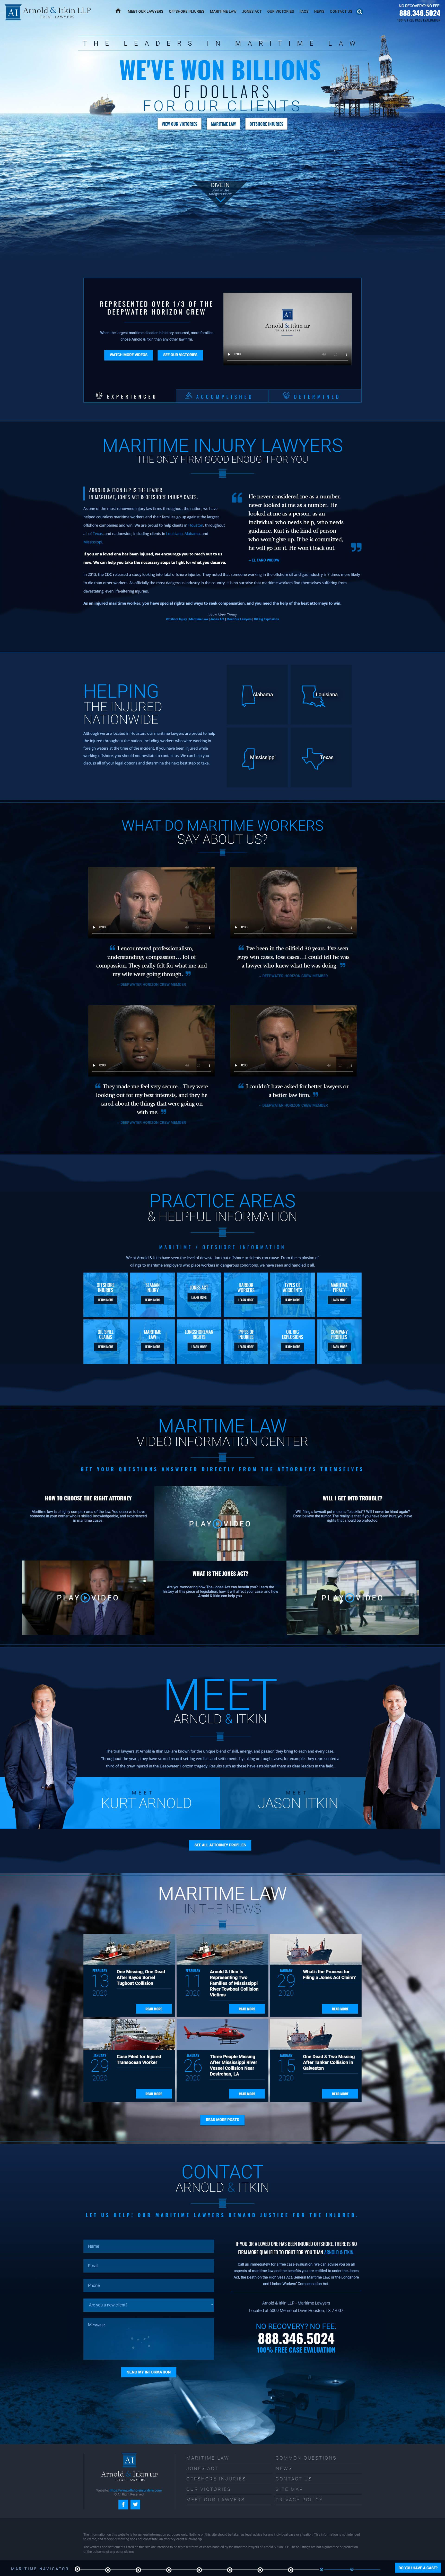 Previous Maritime Law Website Design Sample